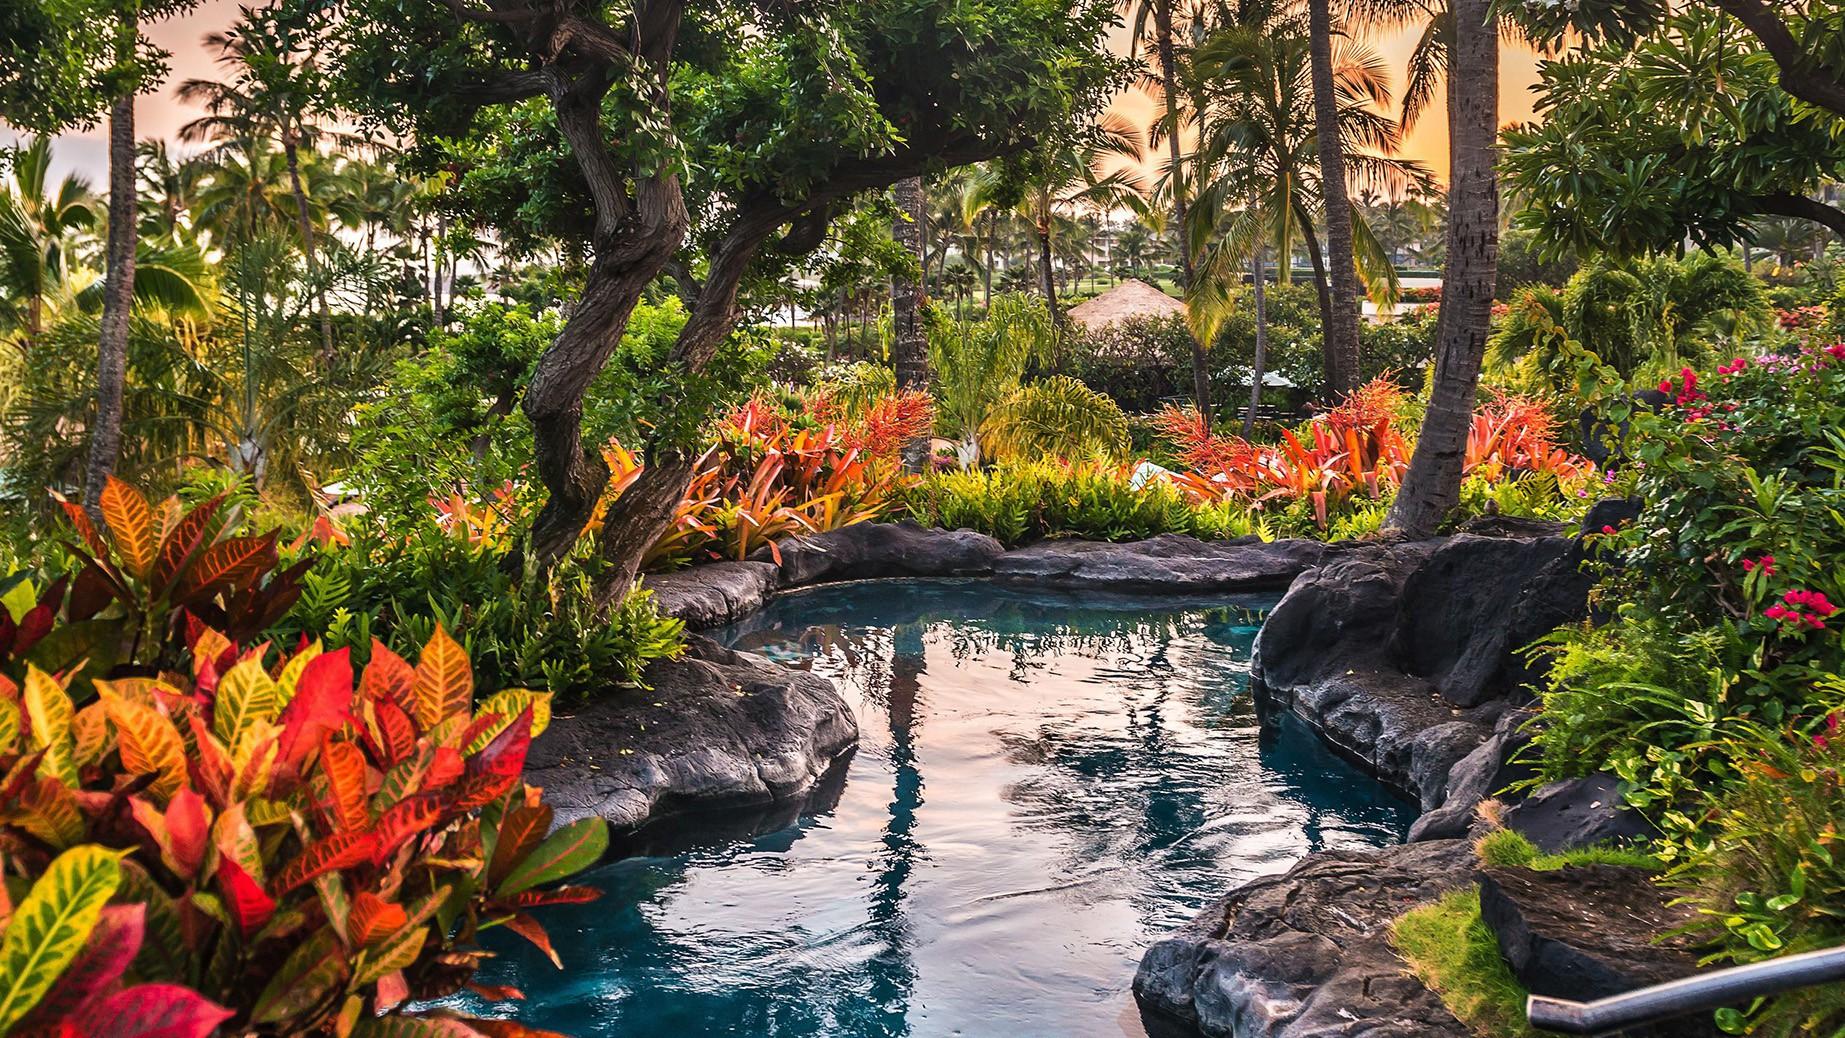 Courtesy of Grand Hyatt Kauai Resort and Spa / Expedia.com